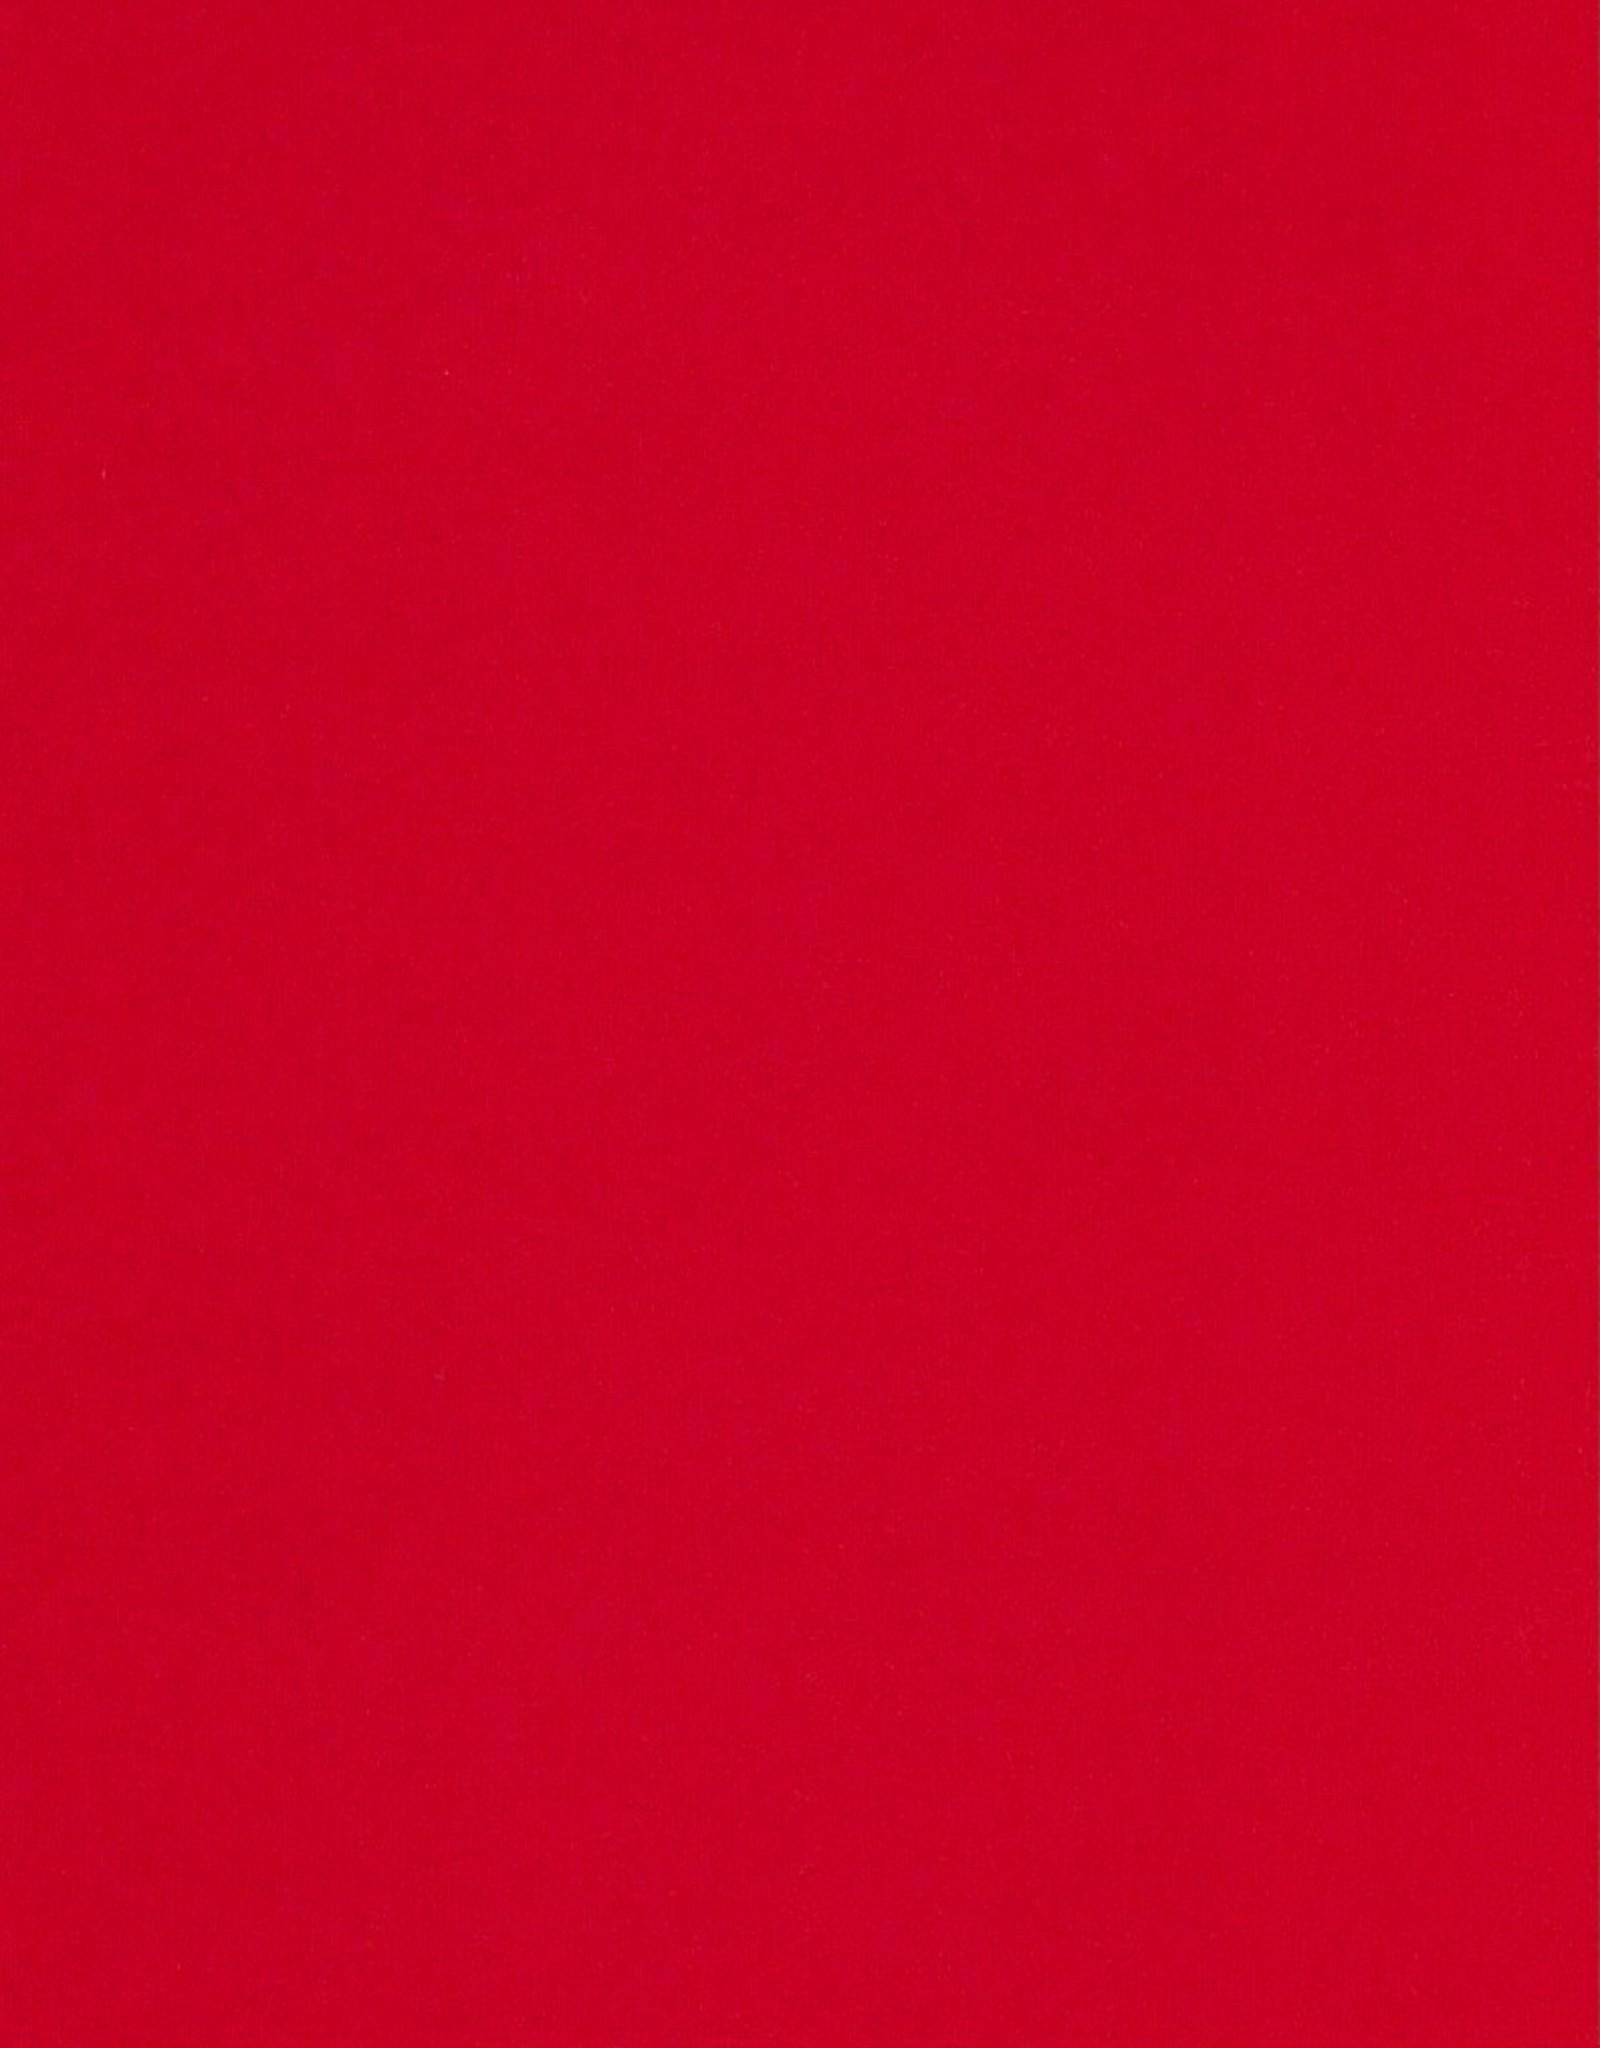 "Fabriano Vice Versa (Elle Erre), Bright Red, 20"" x 27.5"", 220gsm / 135#"